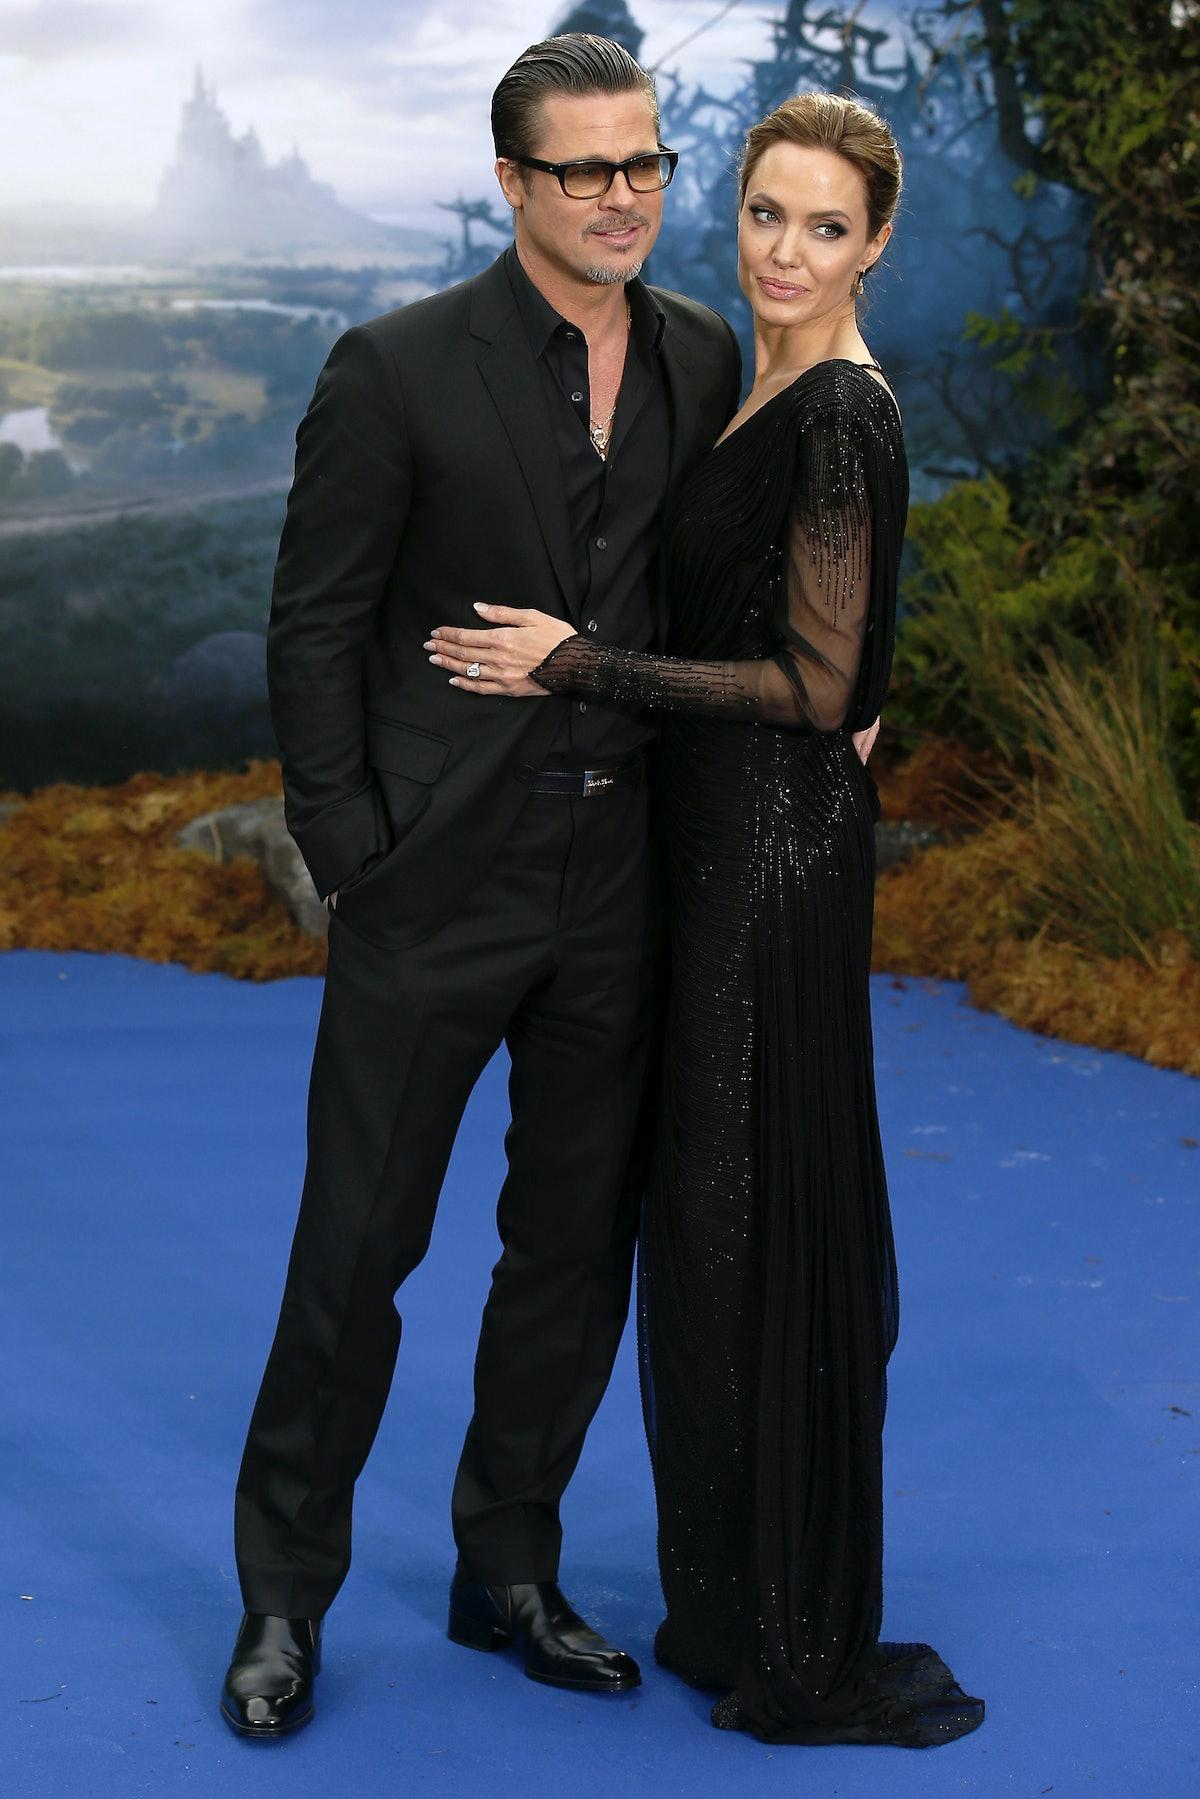 Brangelina wearing all black